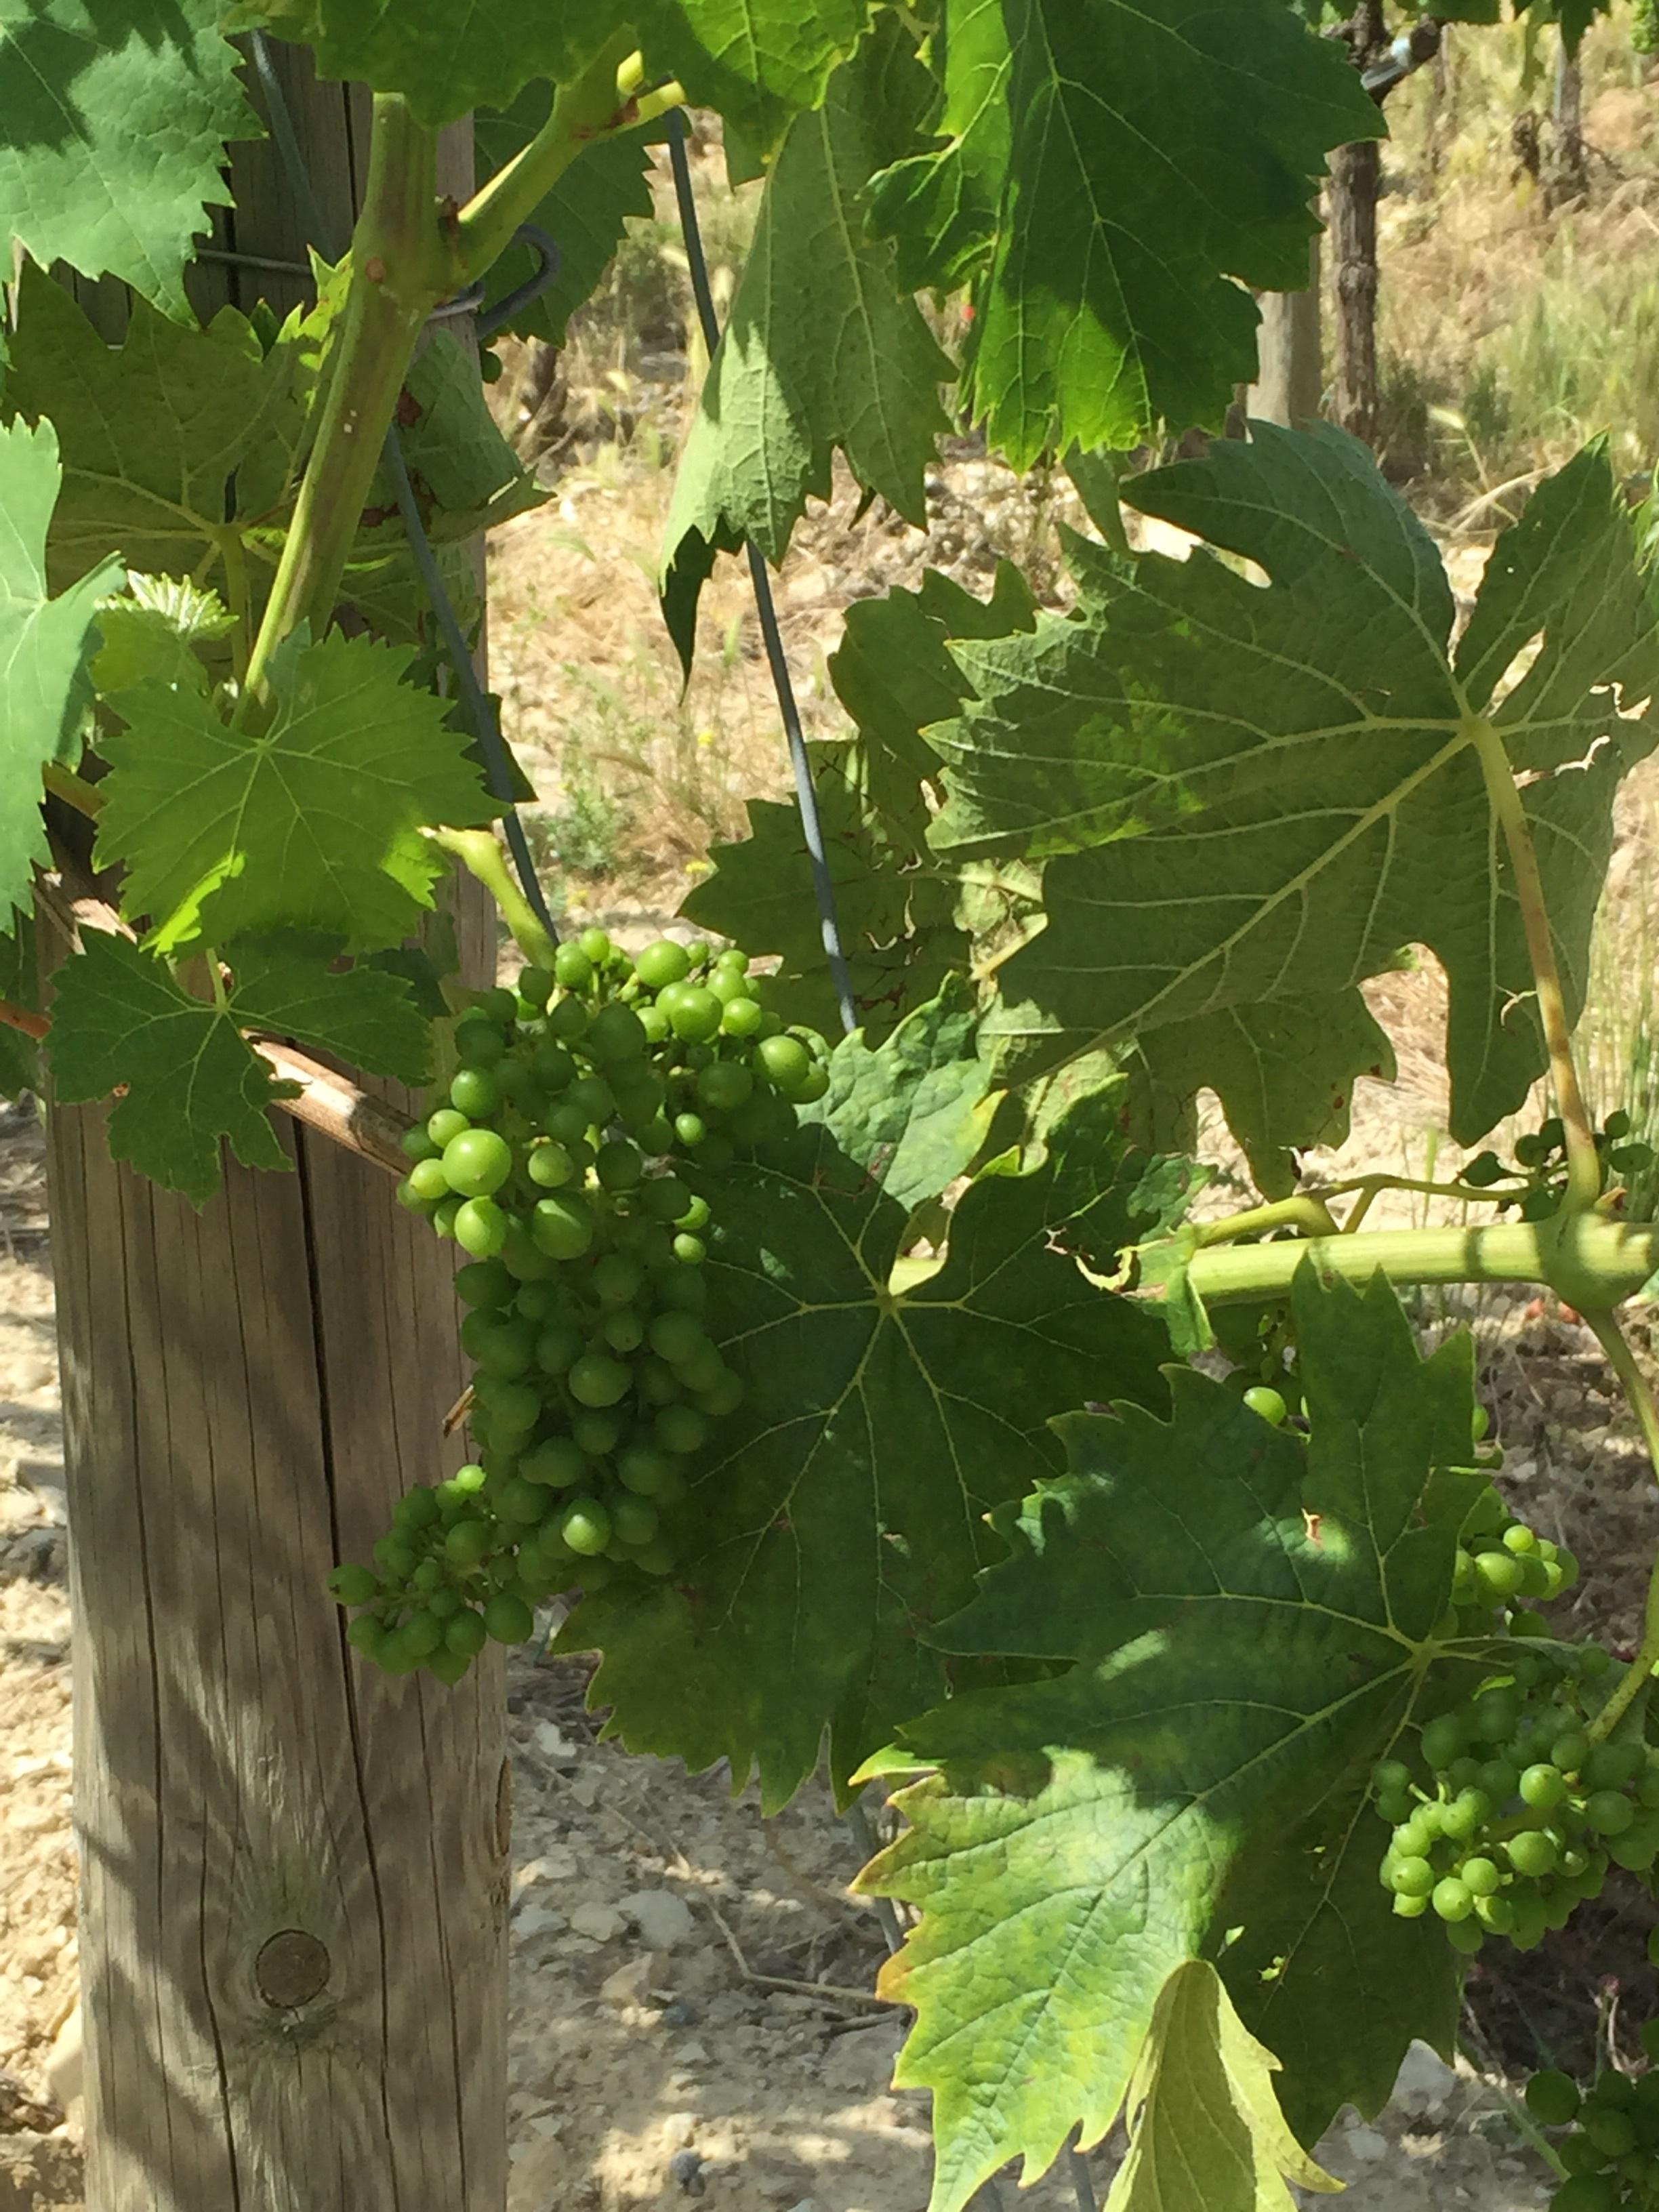 Chiant grapes